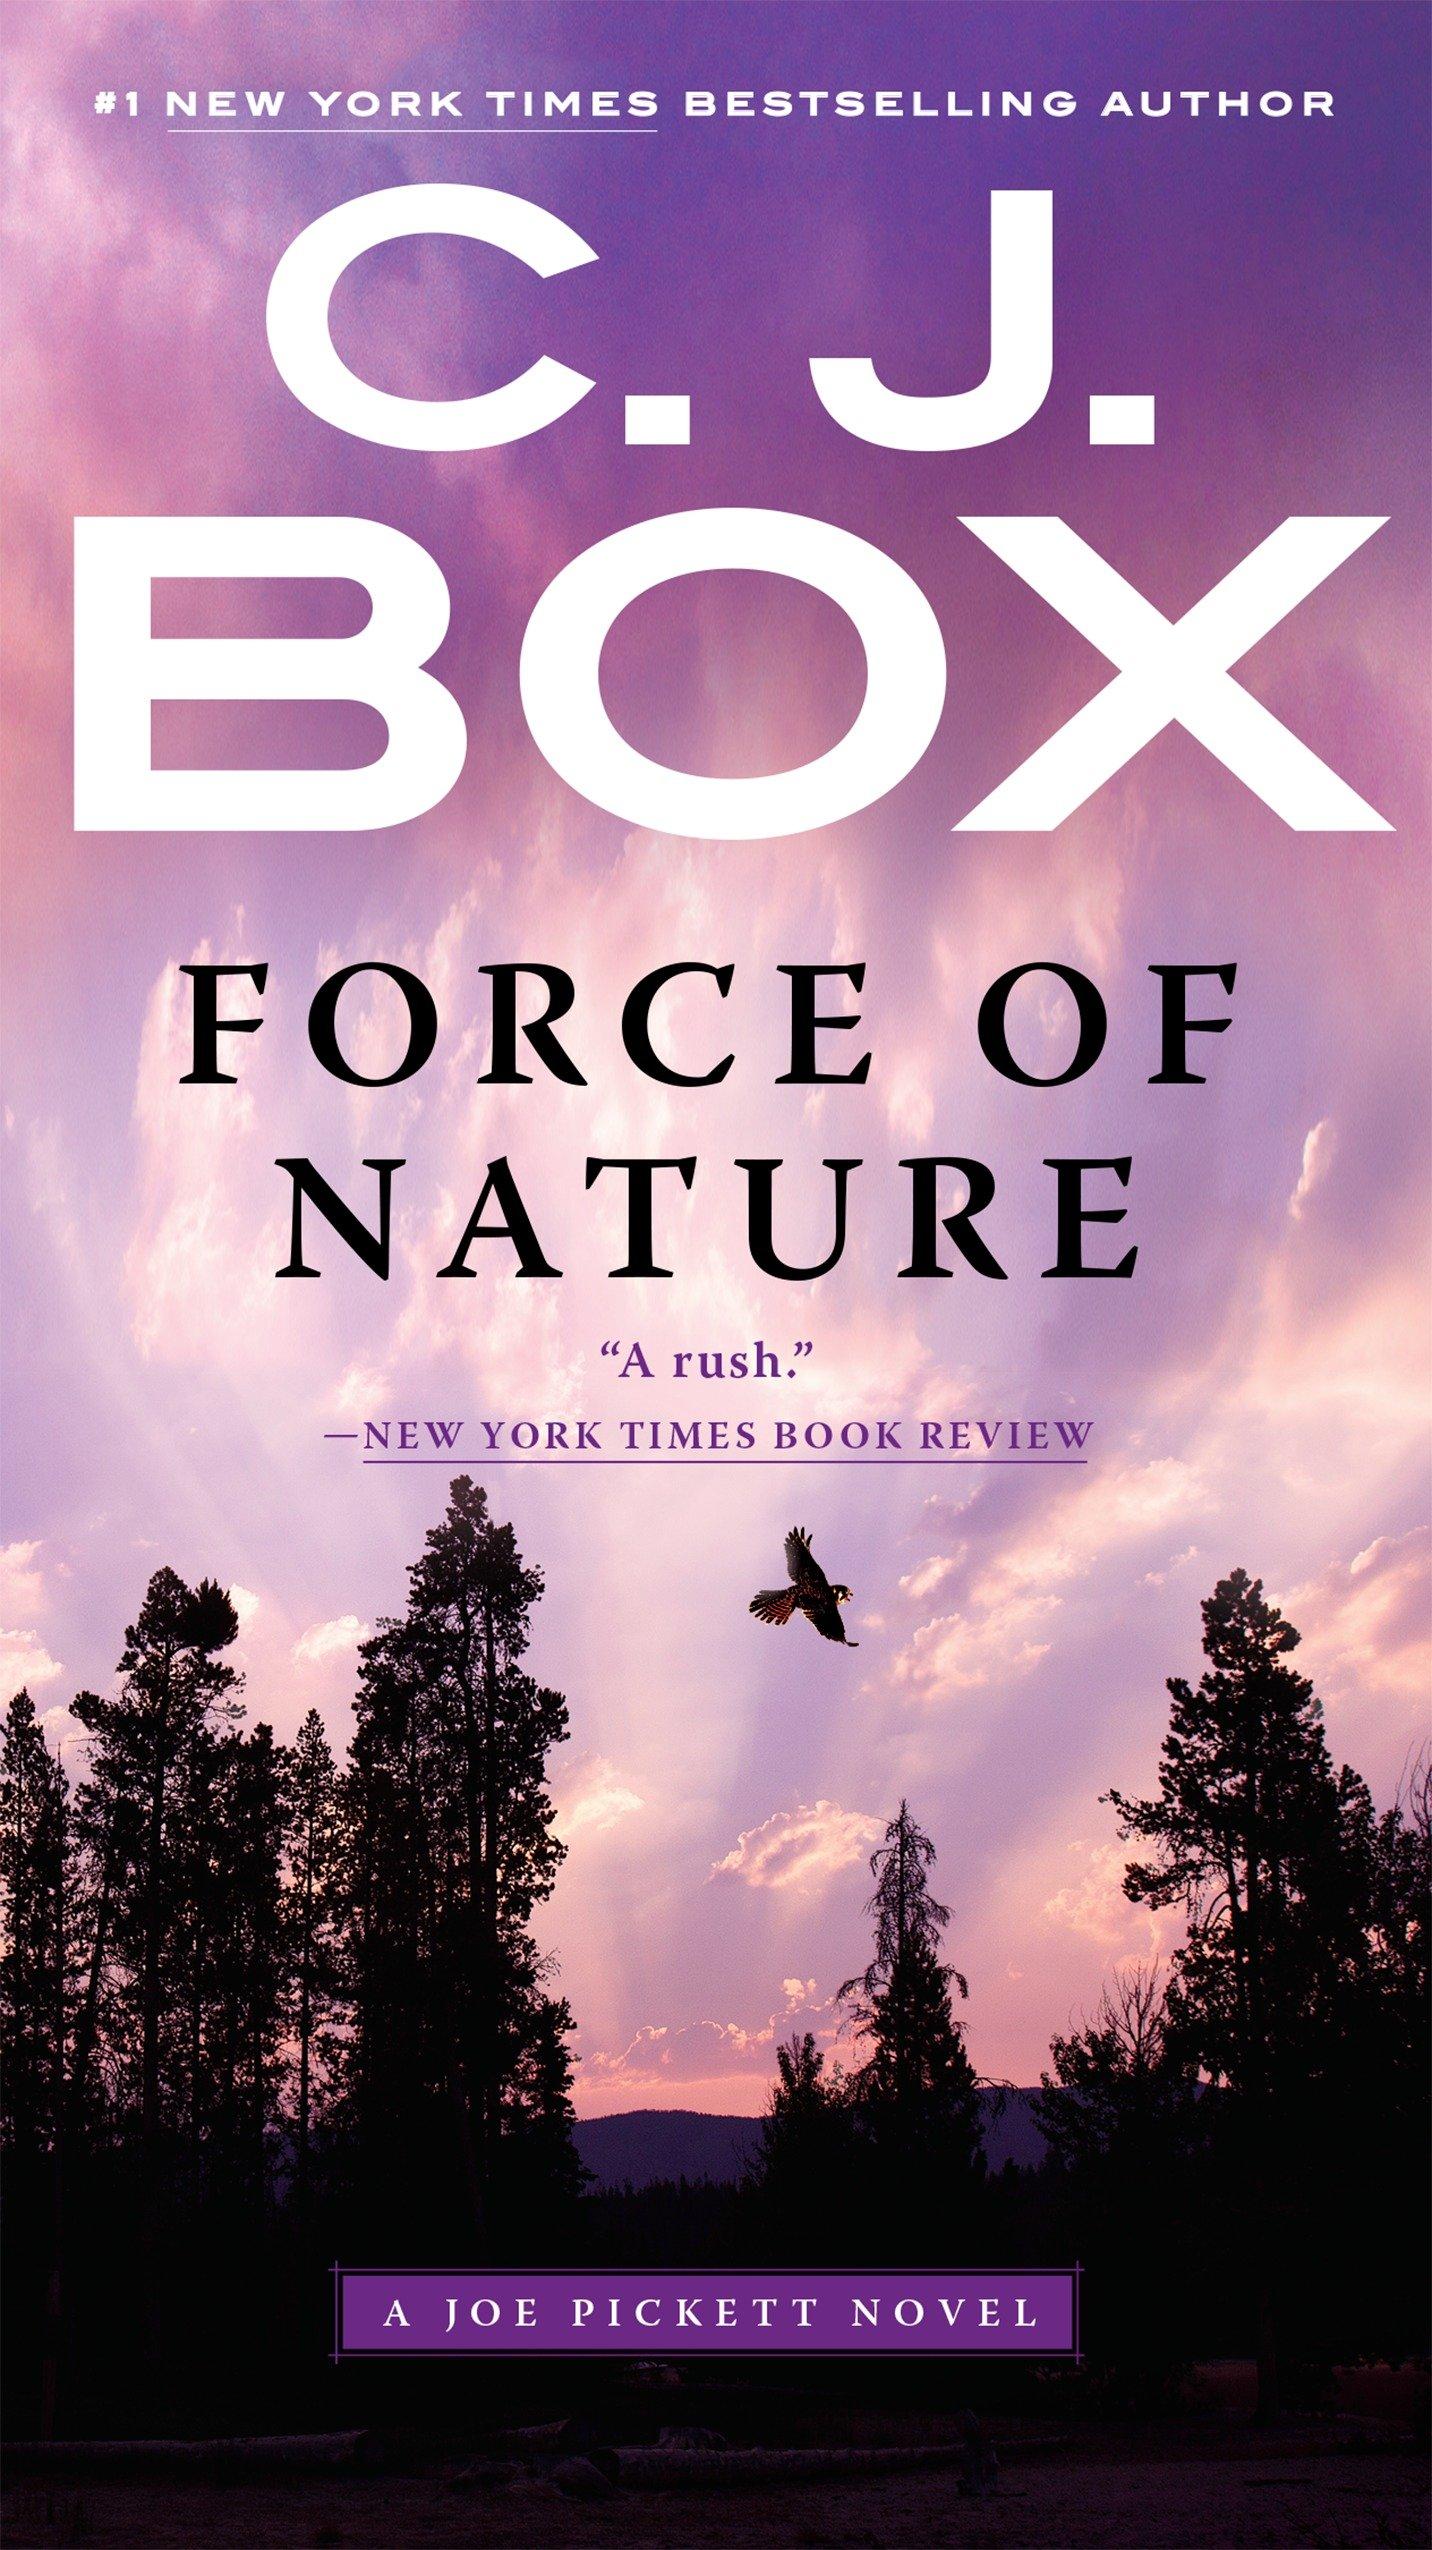 Force of Nature (A Joe Pickett Novel Book 12)